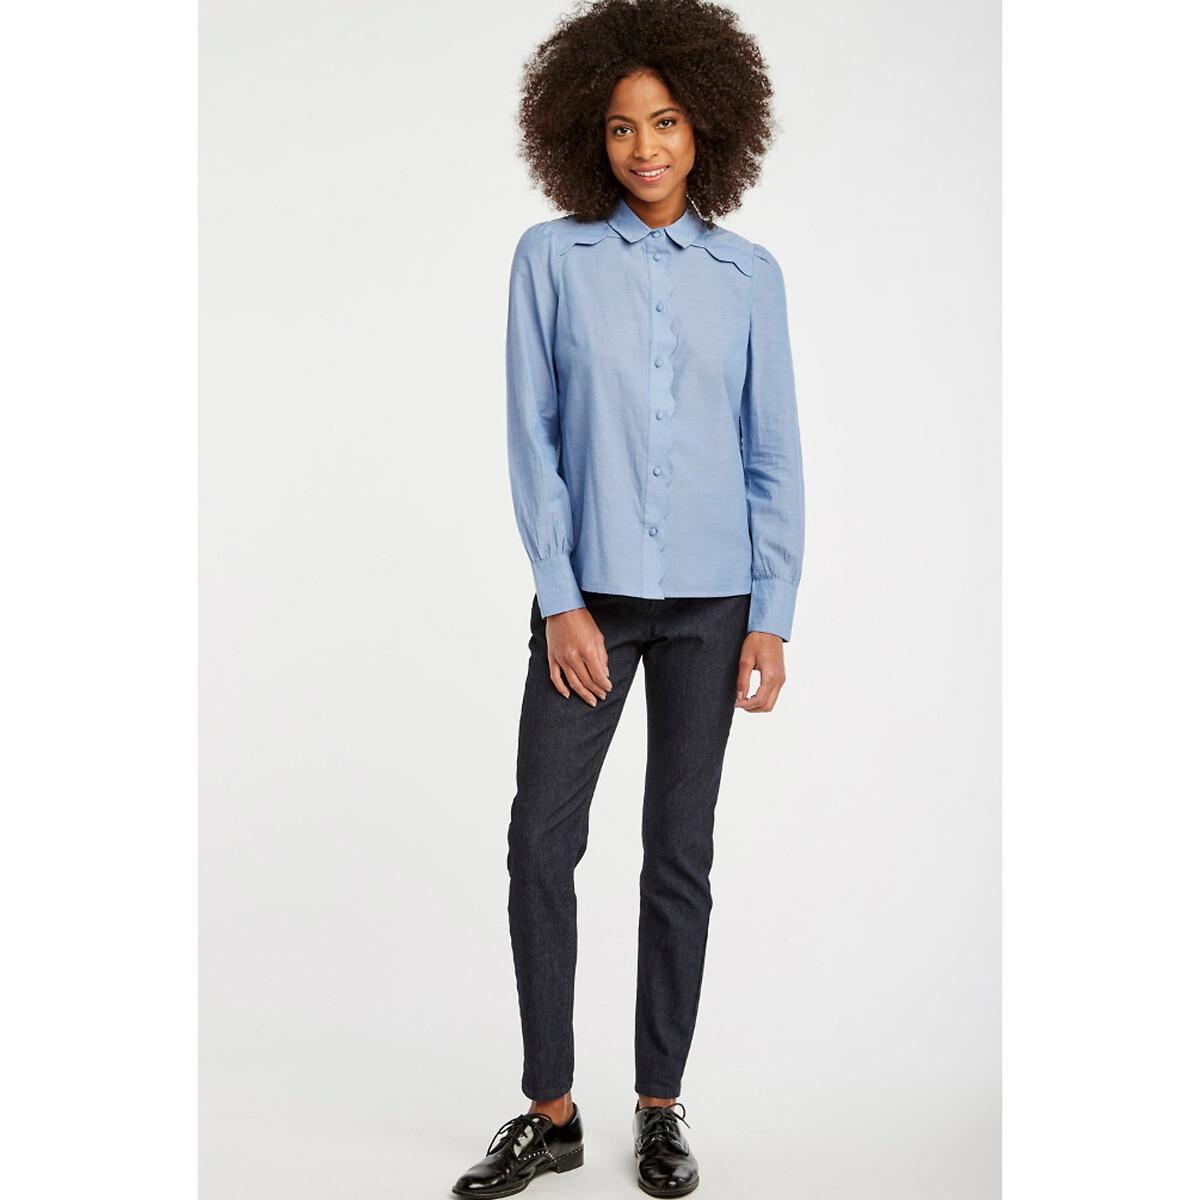 Рубашка La Redoute La Redoute 38 (FR) - 44 (RUS) синий брюки чино la redoute la redoute 38 fr 44 rus синий